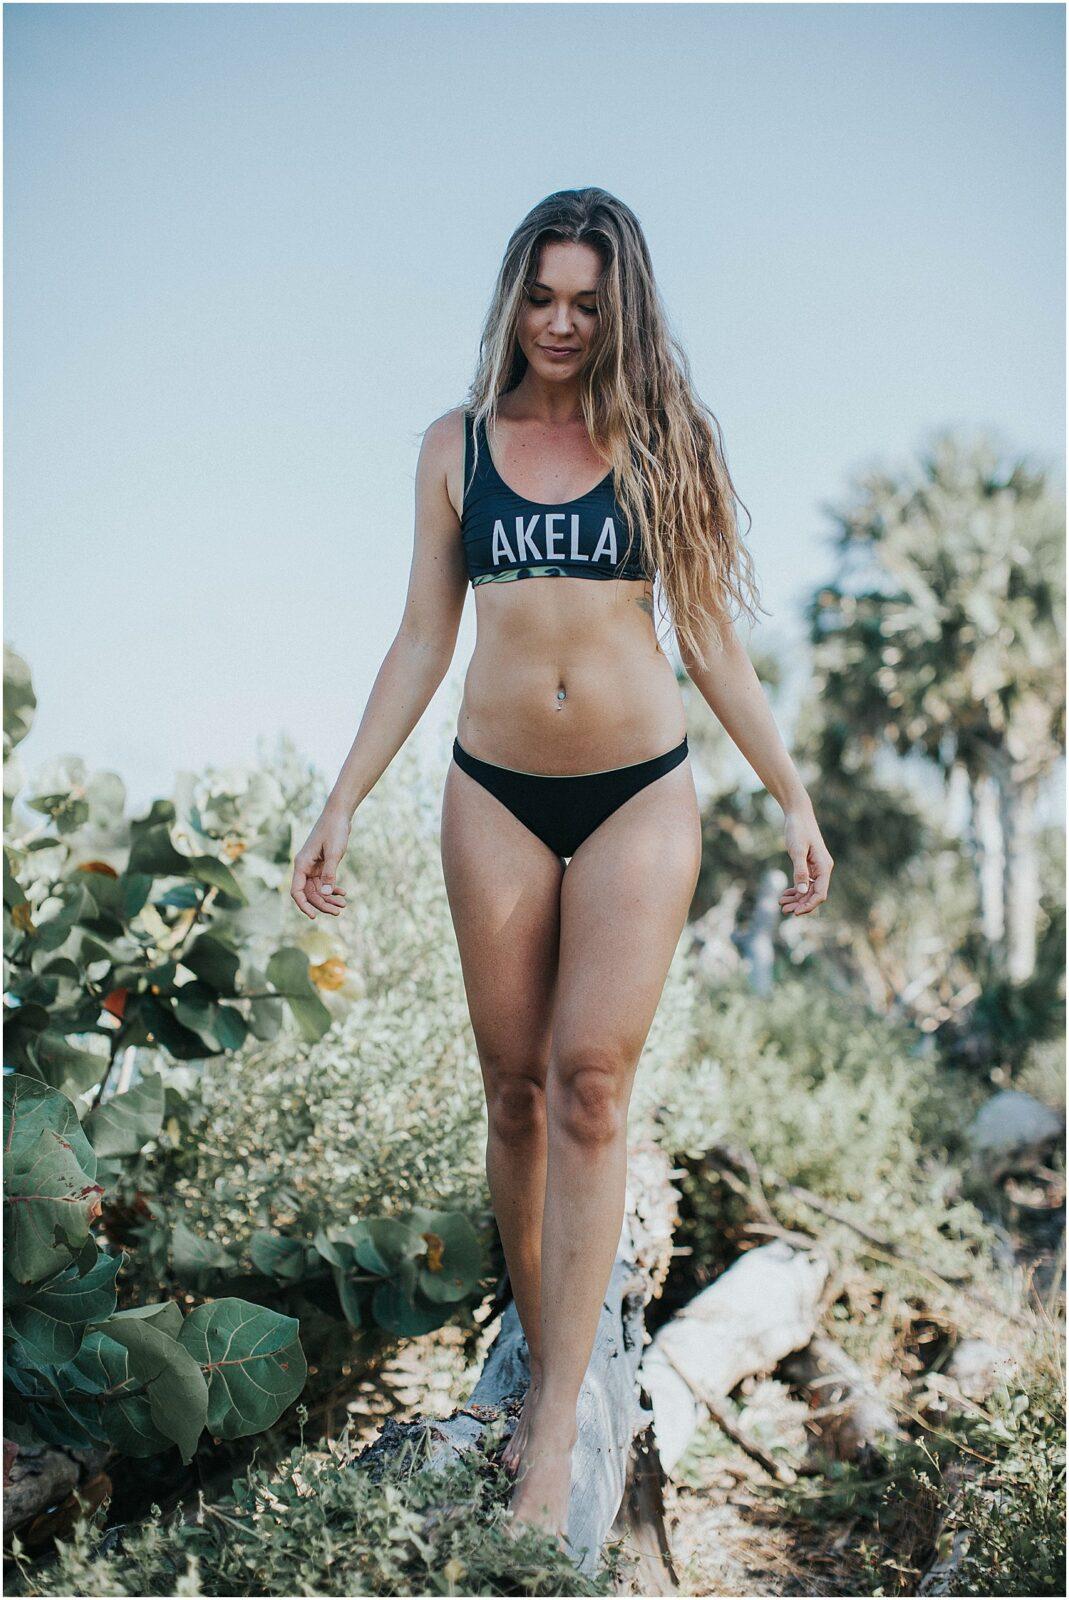 florida bikini photography